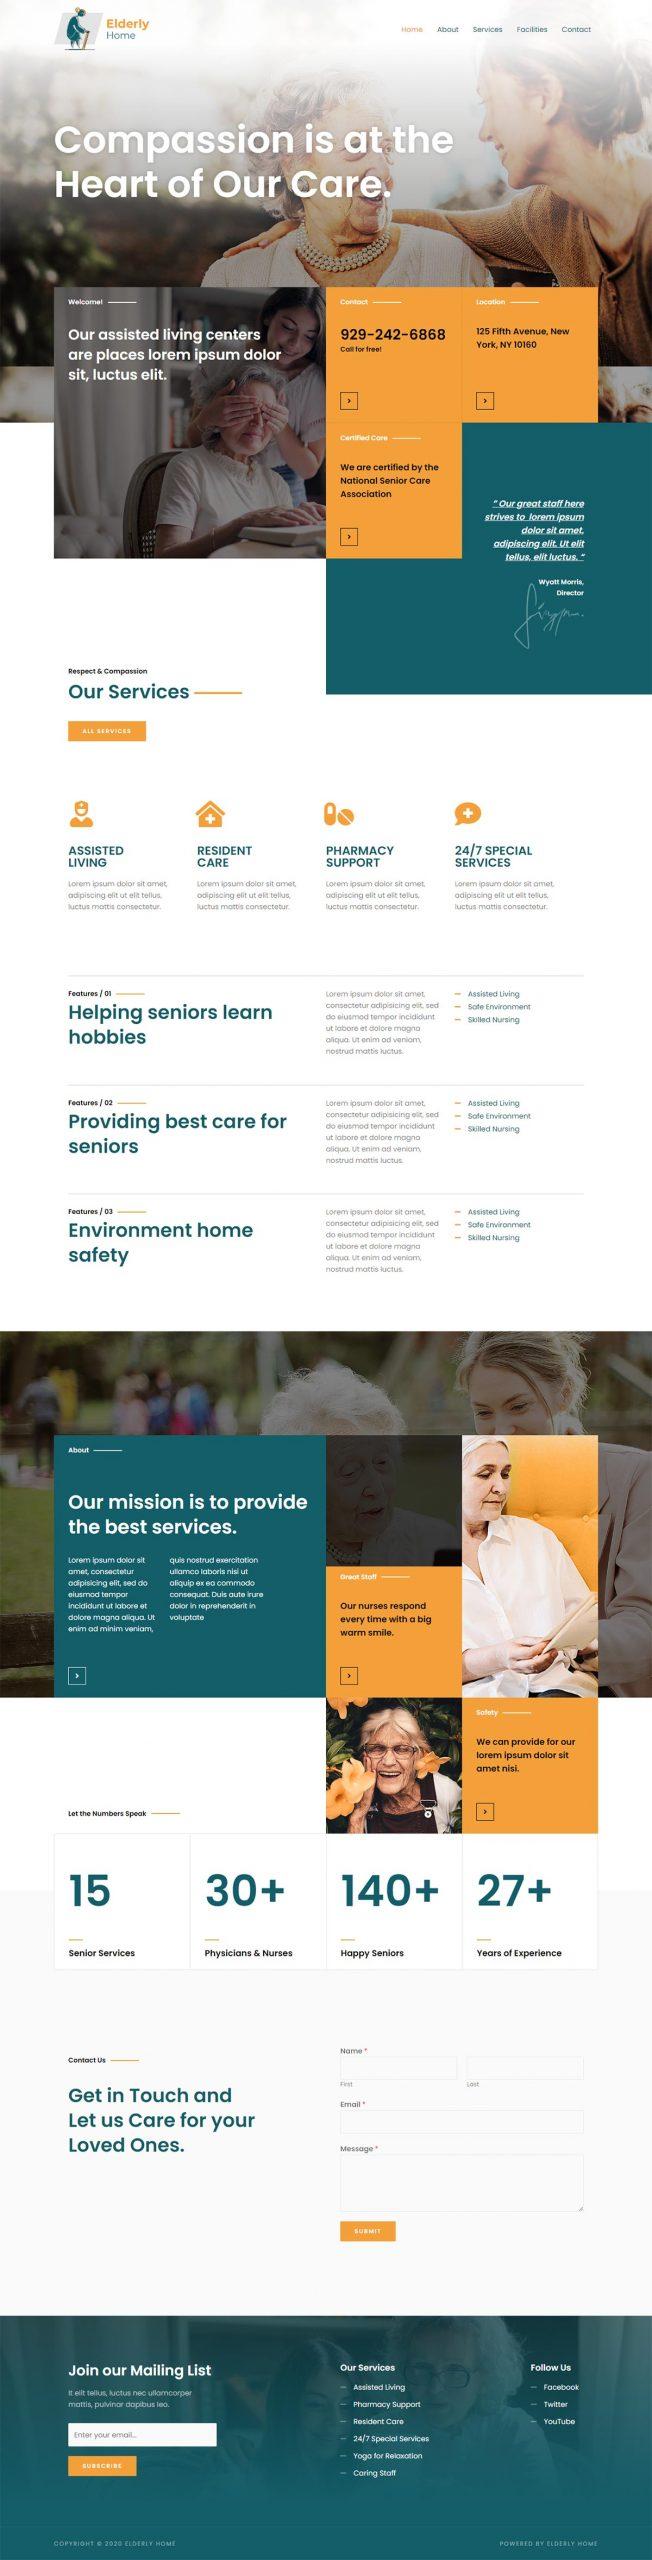 Adamo Web Design | Web Design Durham | elderly care 02 scaled